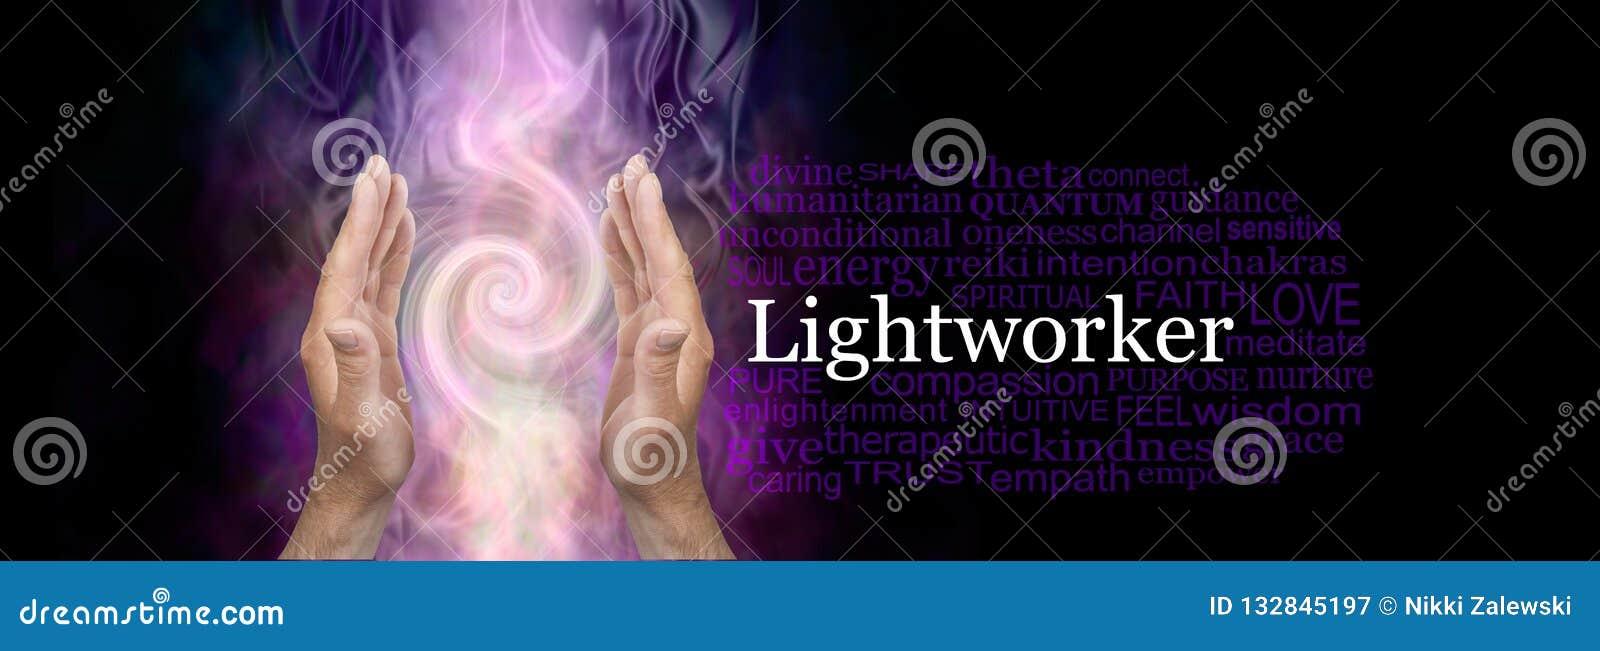 The healing hands of a male Light worker word cloud